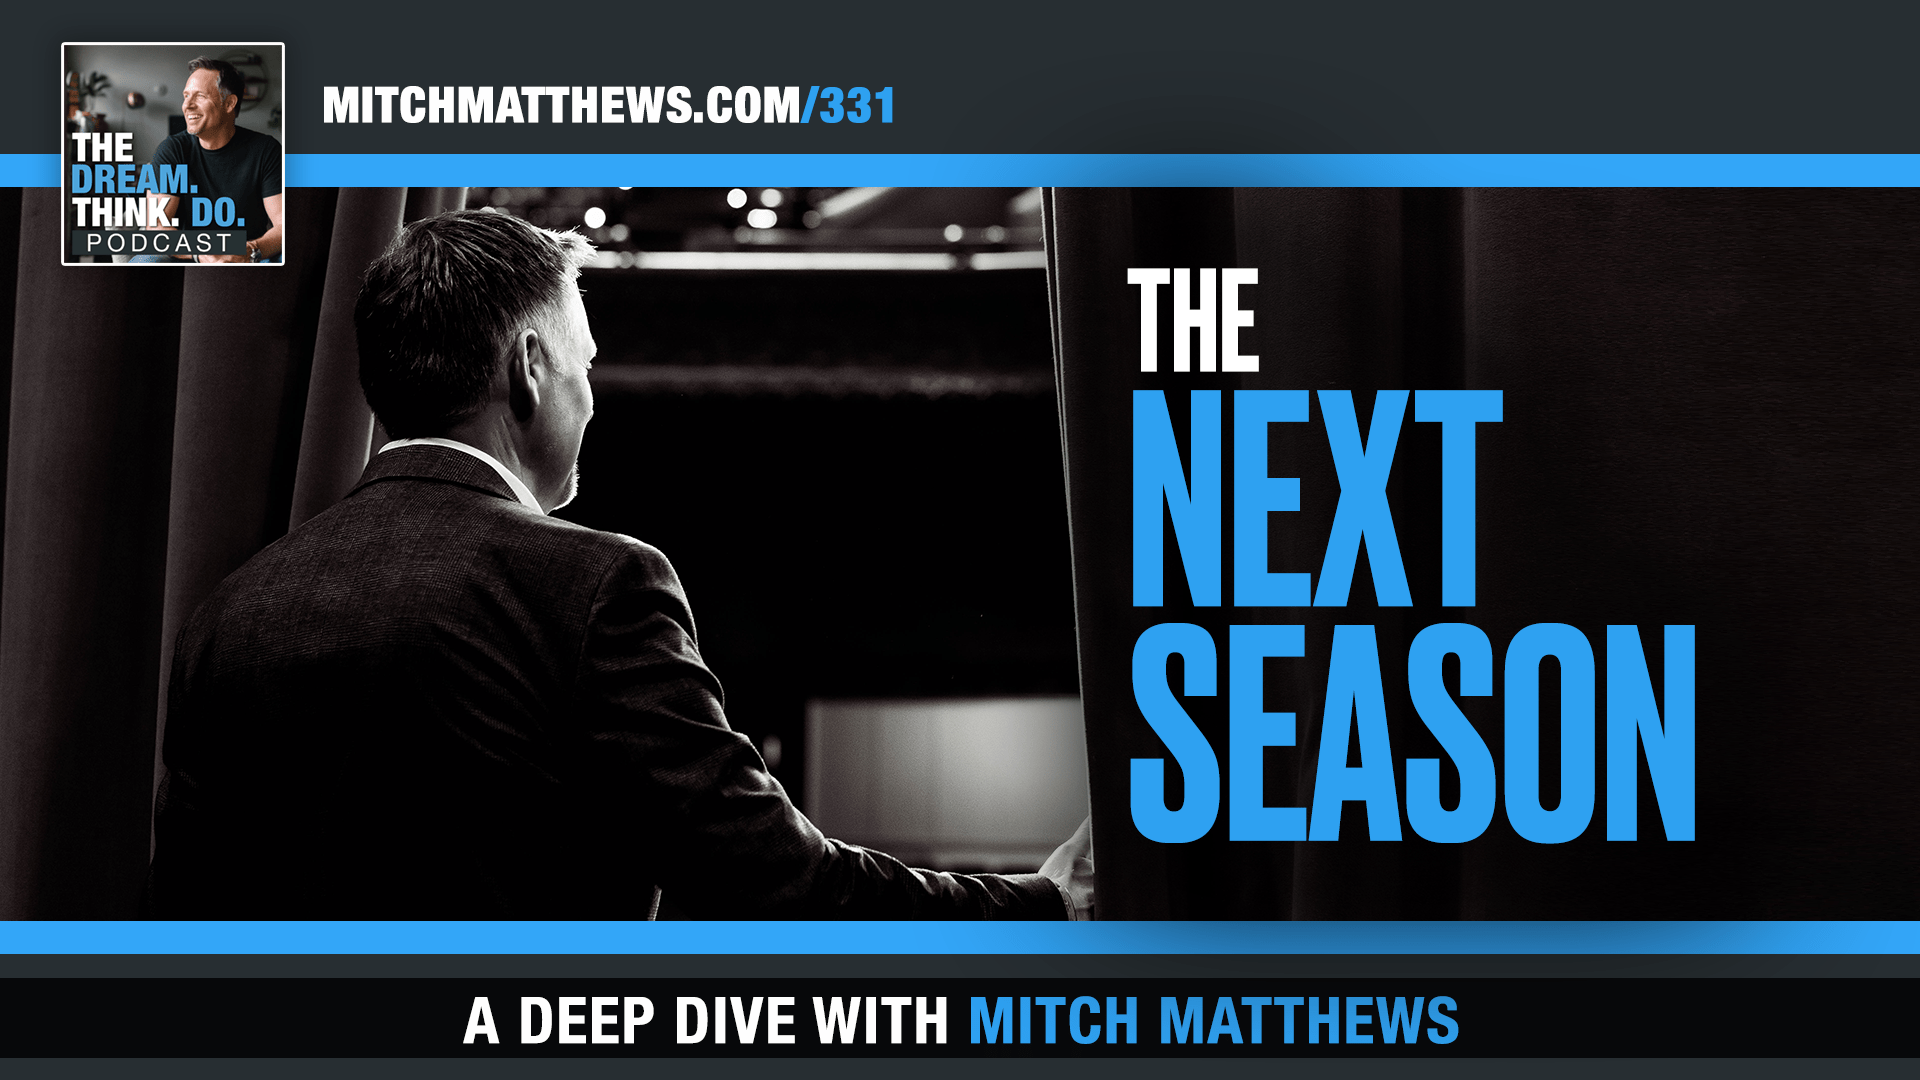 The NEXT Season- Mitch Matthews